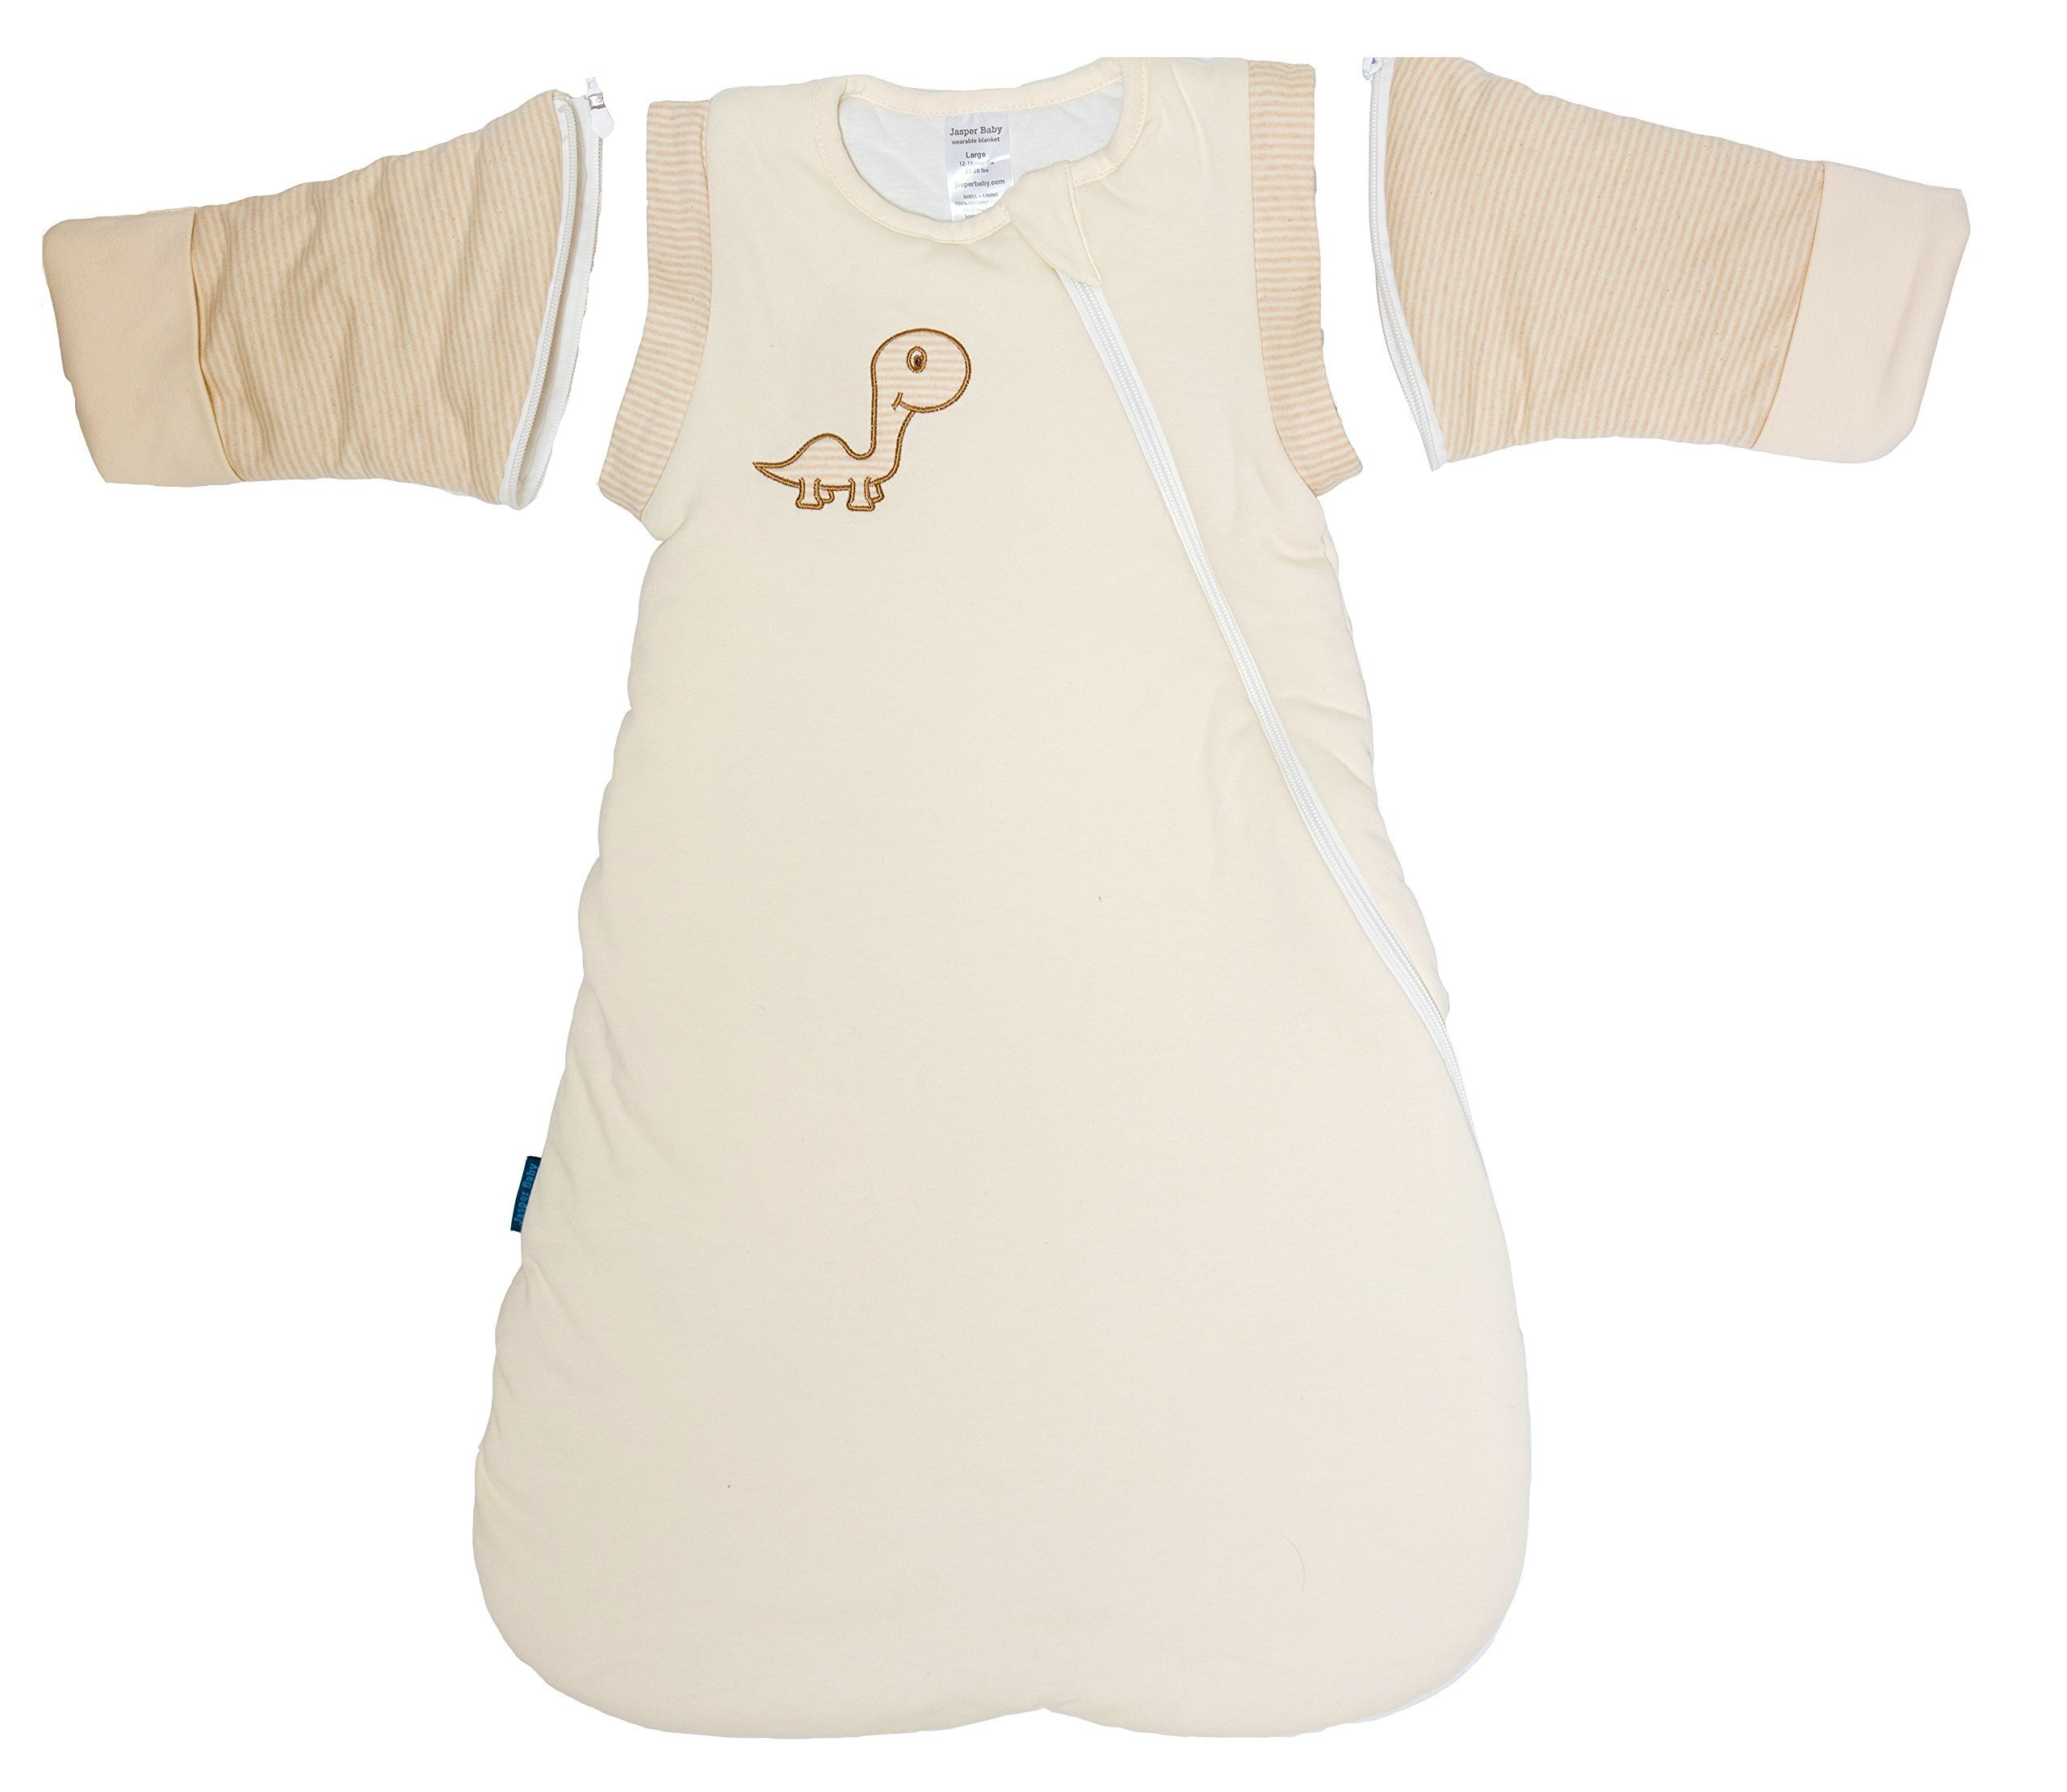 Jasper Baby Attachable Long Sleeves Winter Luna Wearable Blanket (XLarge 20-26 Months) by Jasper Baby